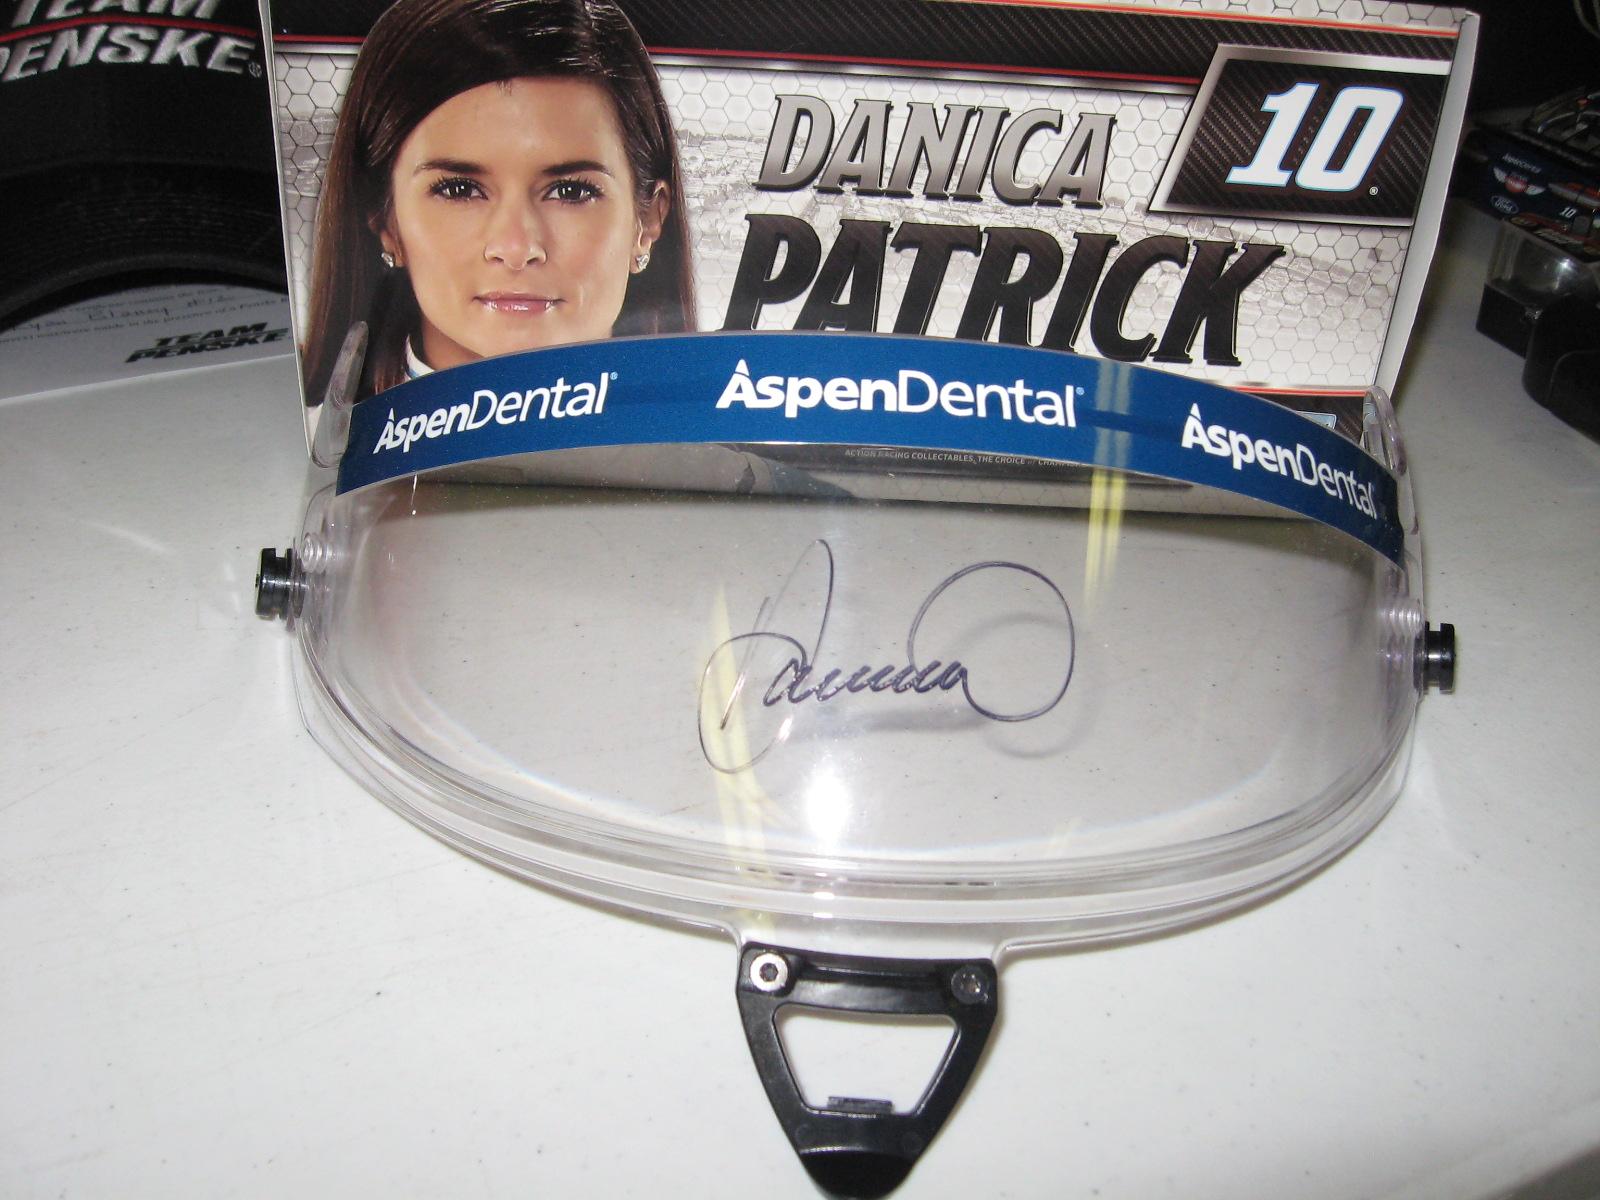 Danica Patrick Signed Race Worn Helmet Visor